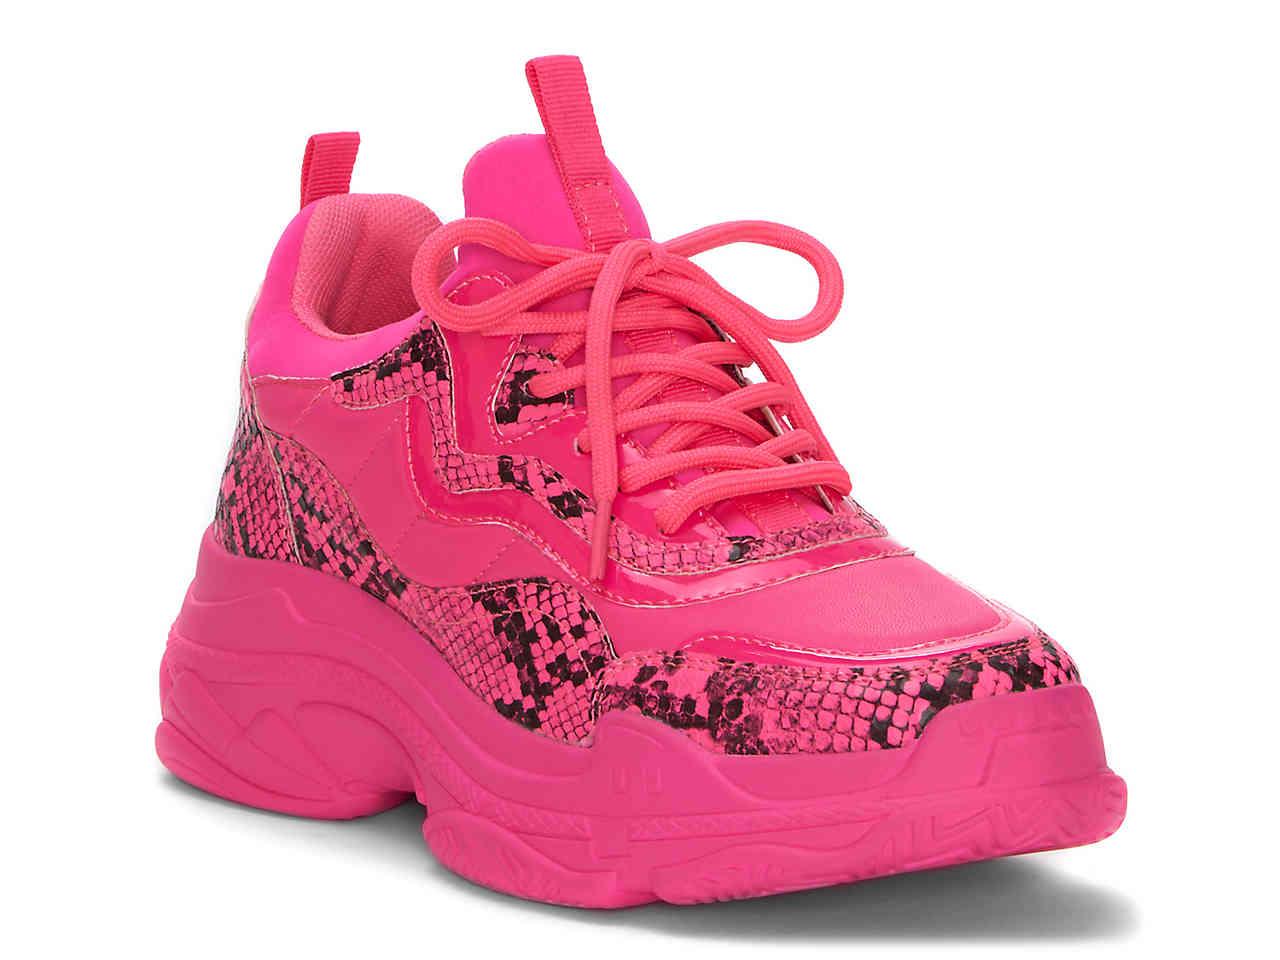 Speedey NEON PINK Sneaker | eBay